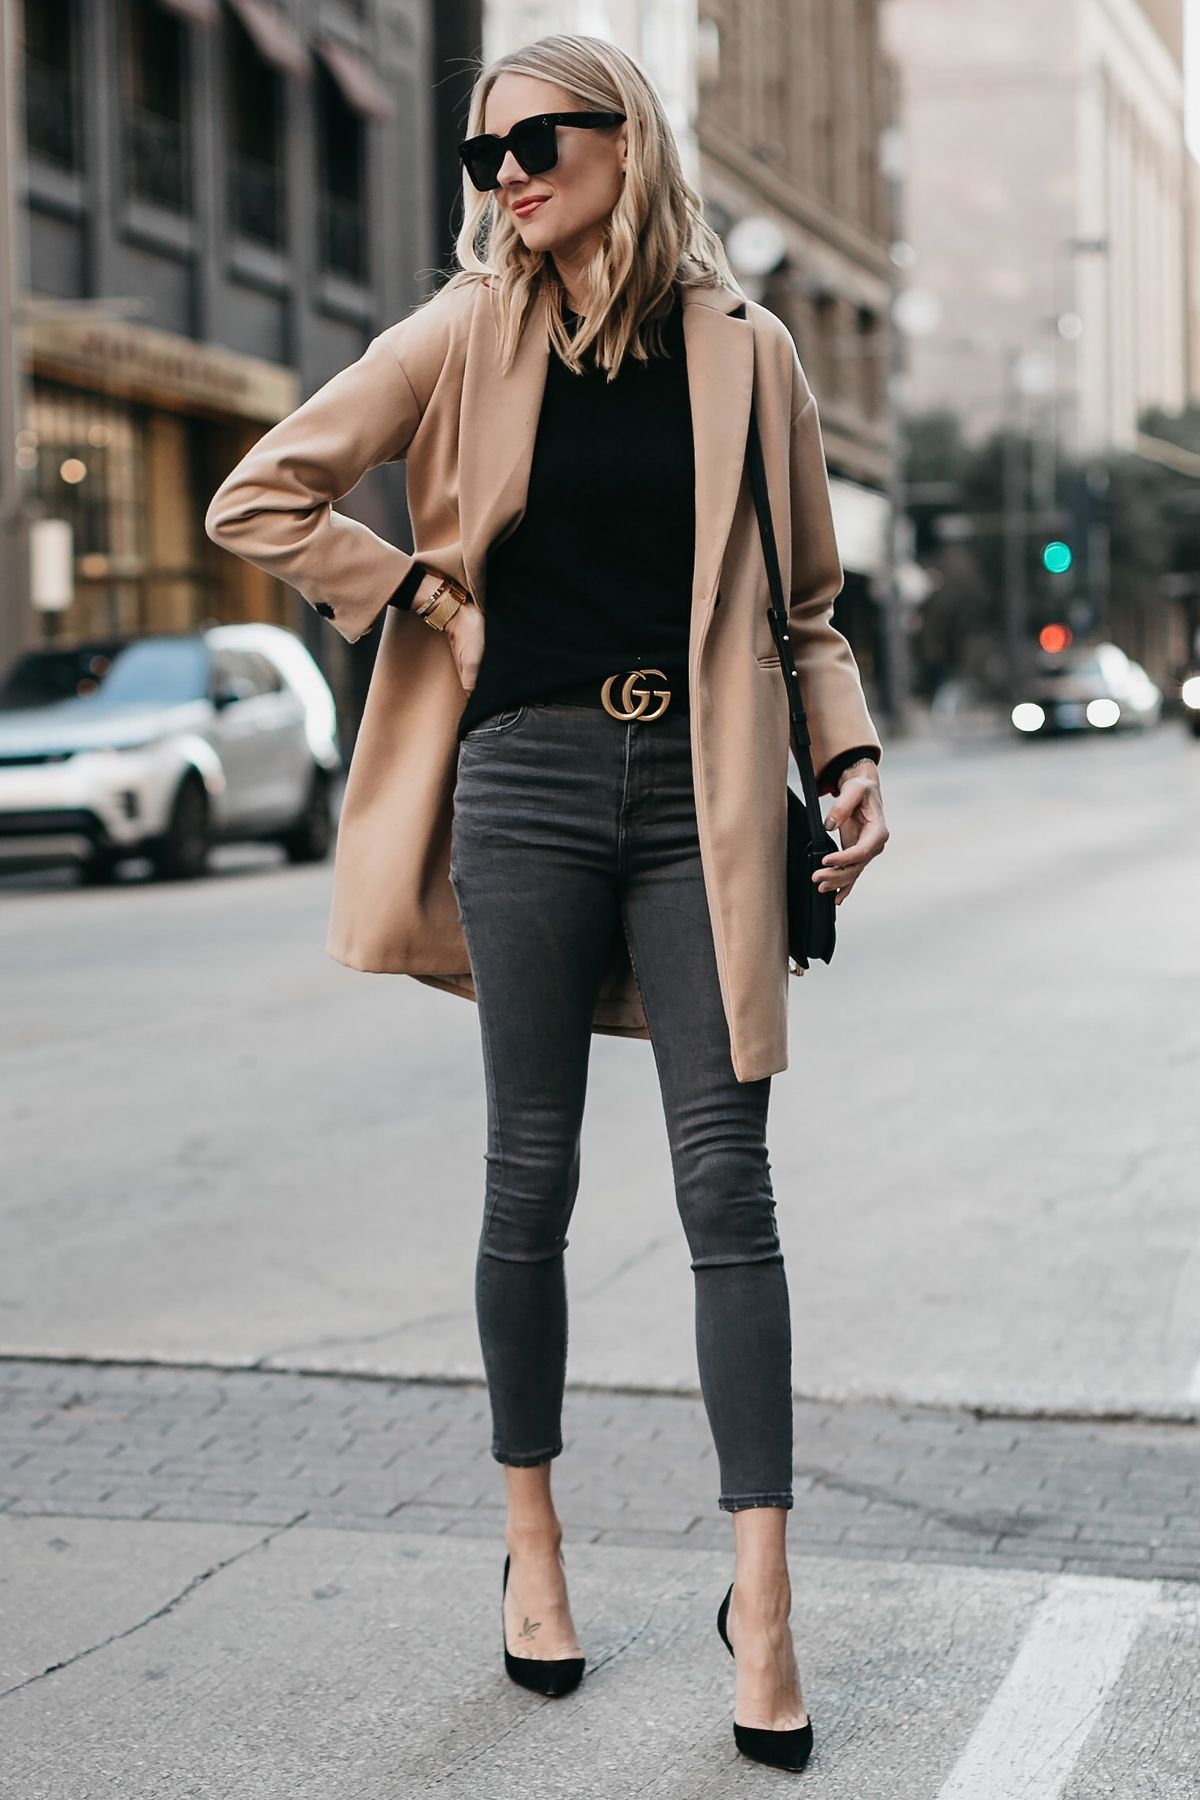 aa96bc4c4e14 Blonde Woman Wearing Topshop Camel Coat Black Sweater Grey Skinny Jeans  Gucci Marmont Belt Christian Louboutin Black Pumps Fashion Jackson Dallas  Blogger ...